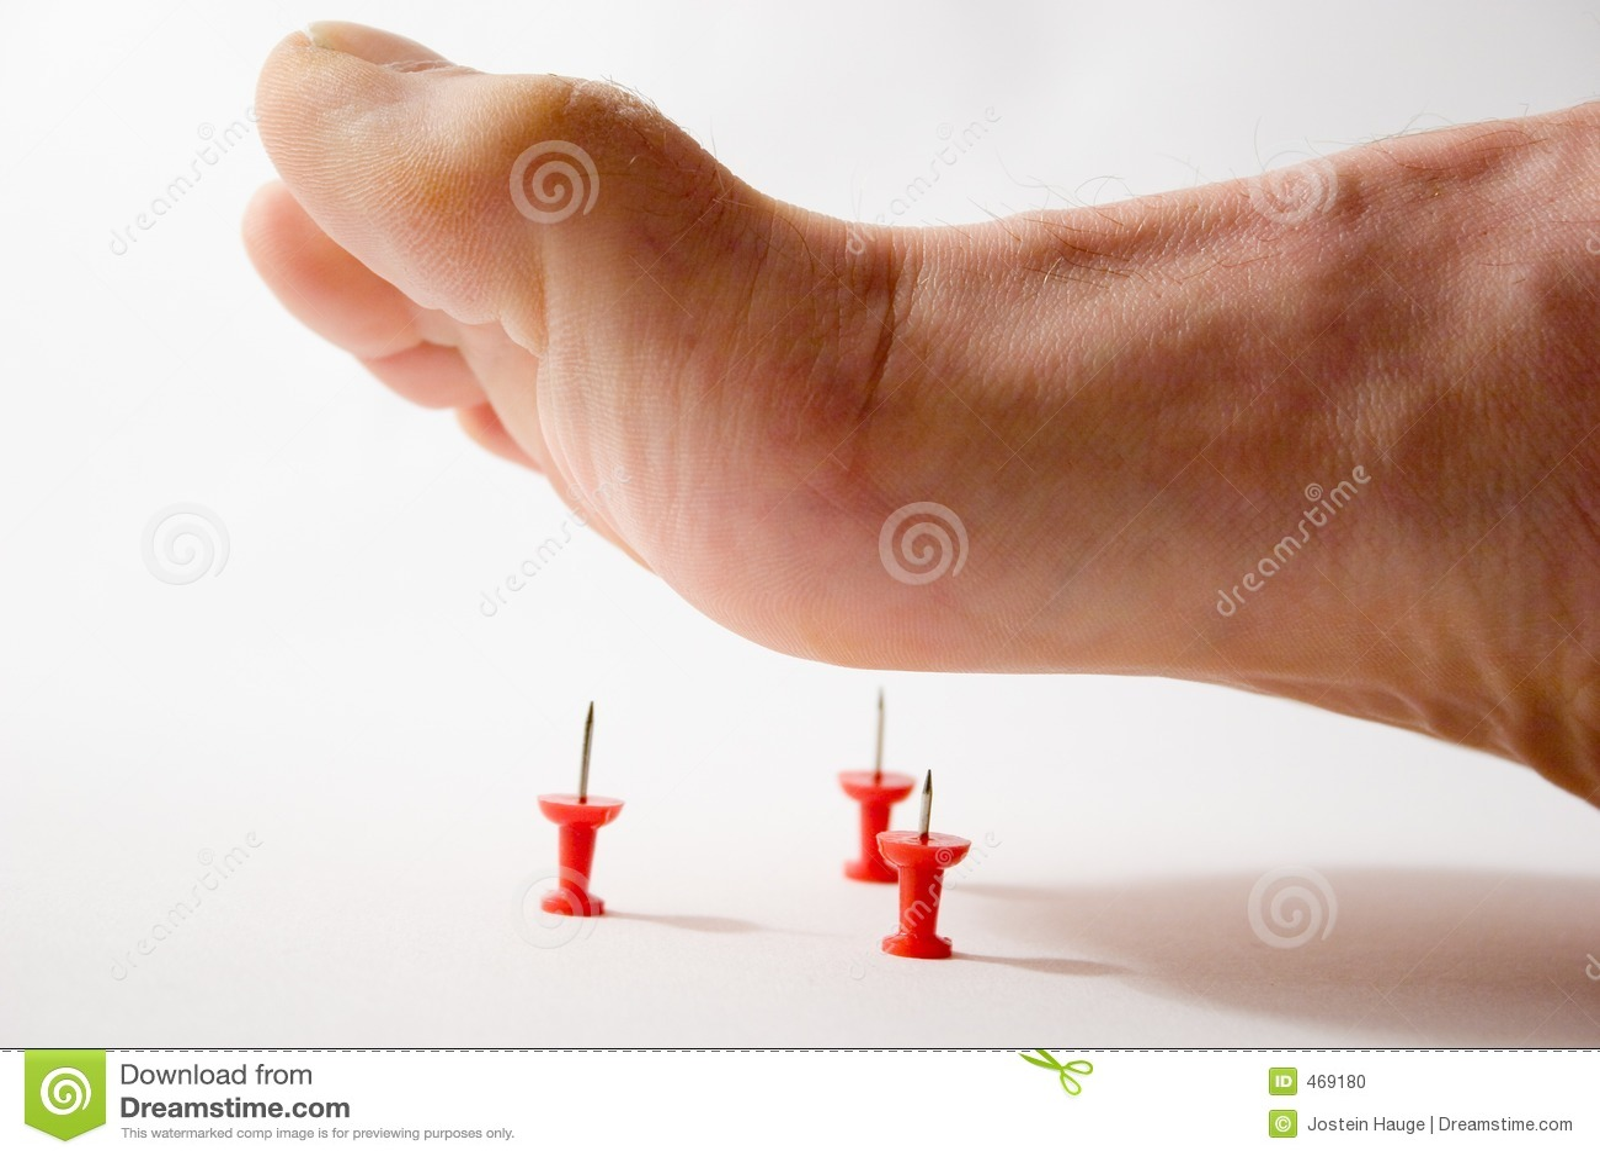 Download Foot Pain stock photo. Image of pierce, hurt, podiatrist - 469180